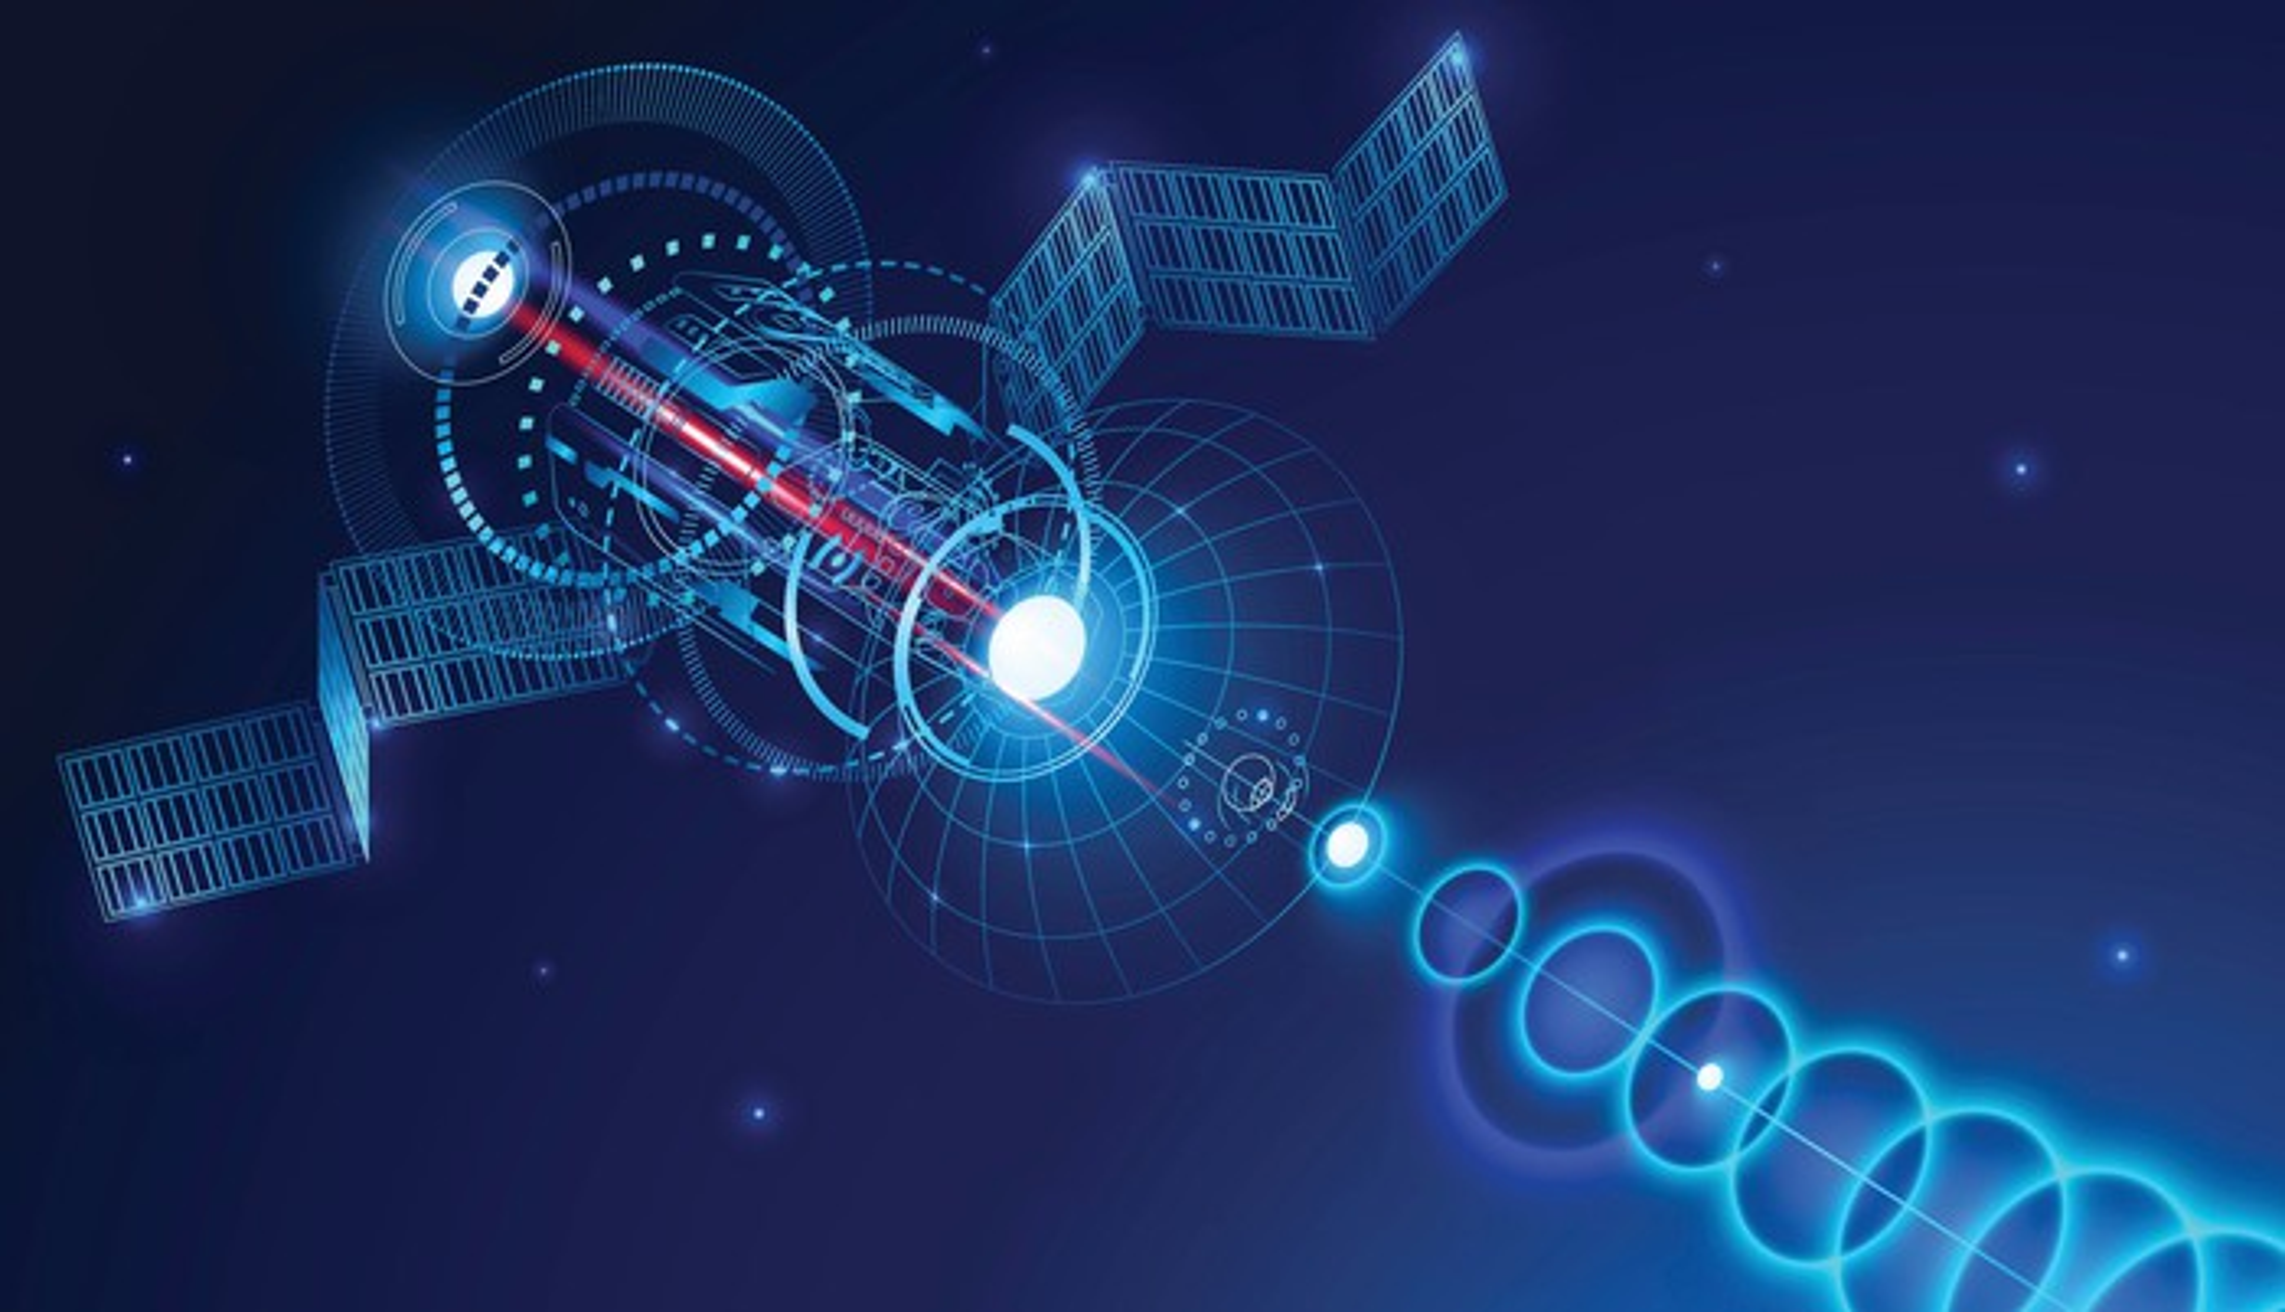 Satellite in space, beaming back to something